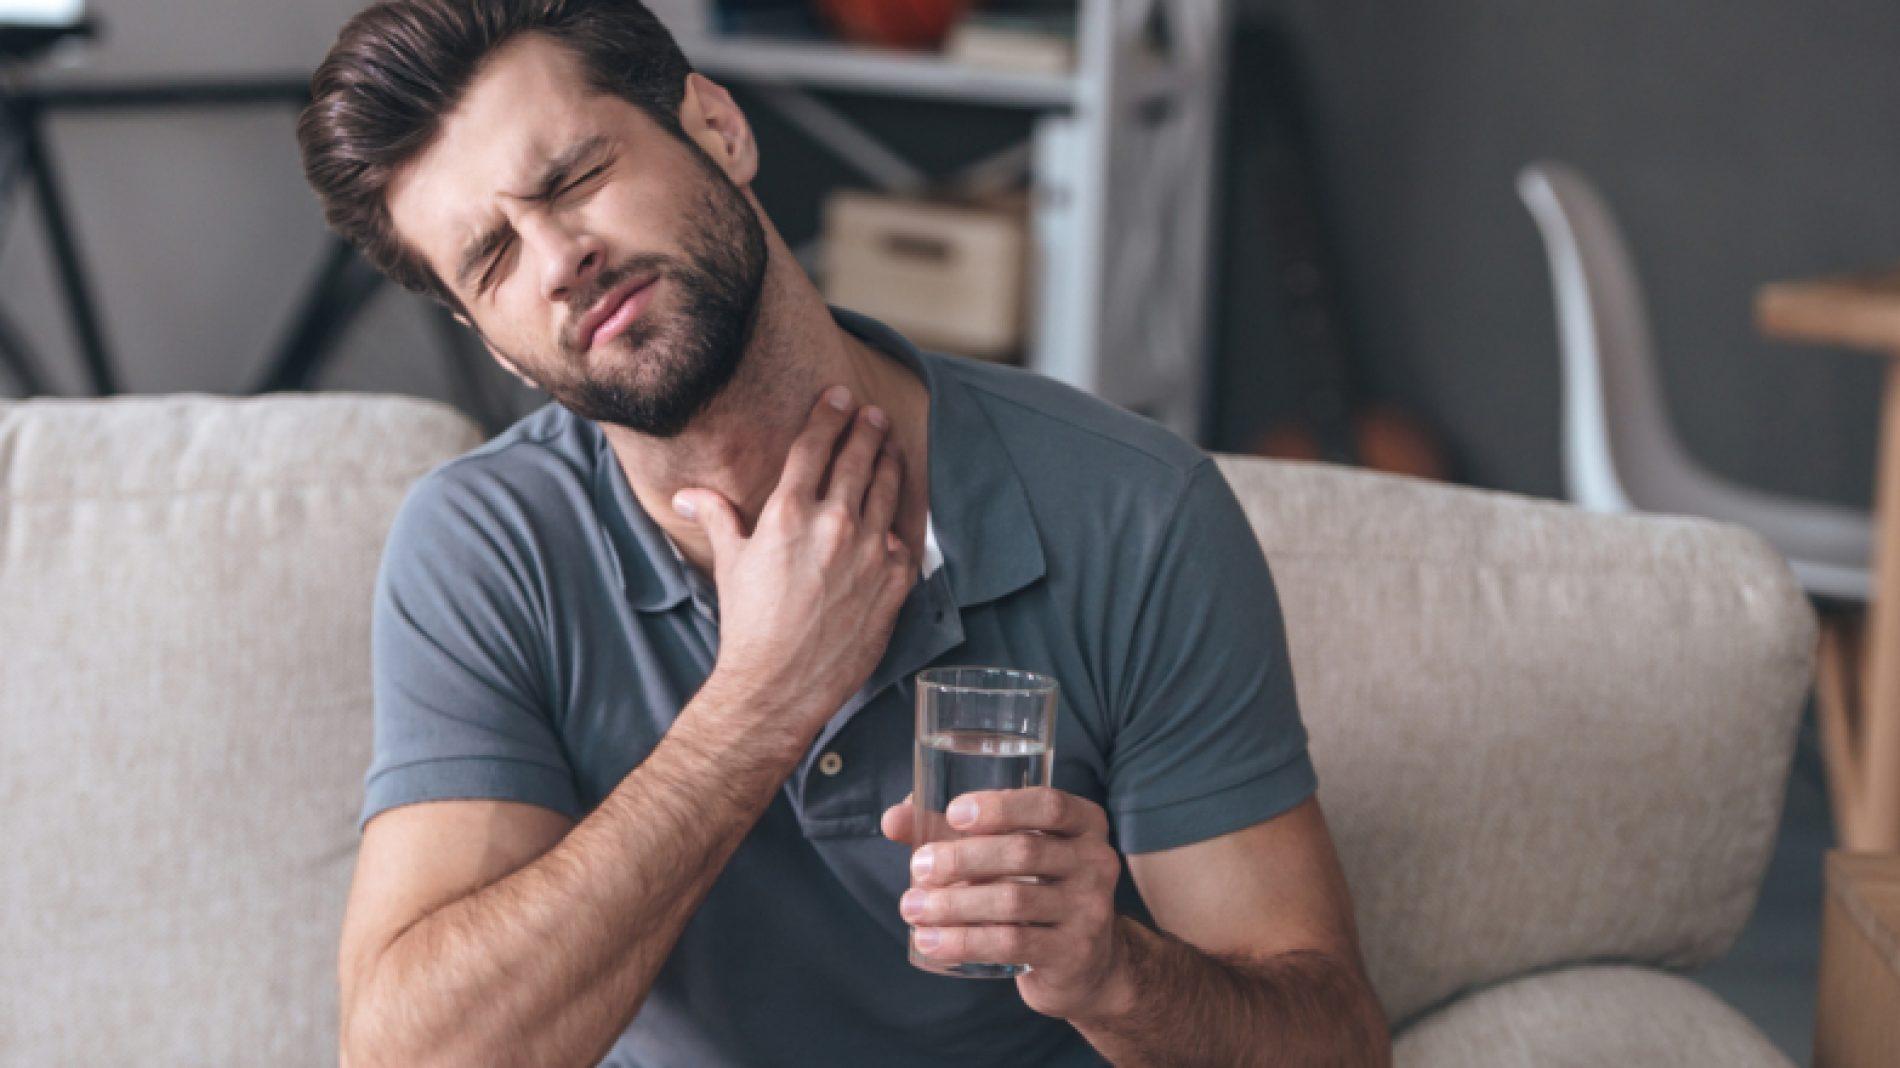 sore-throat-g2kIQb